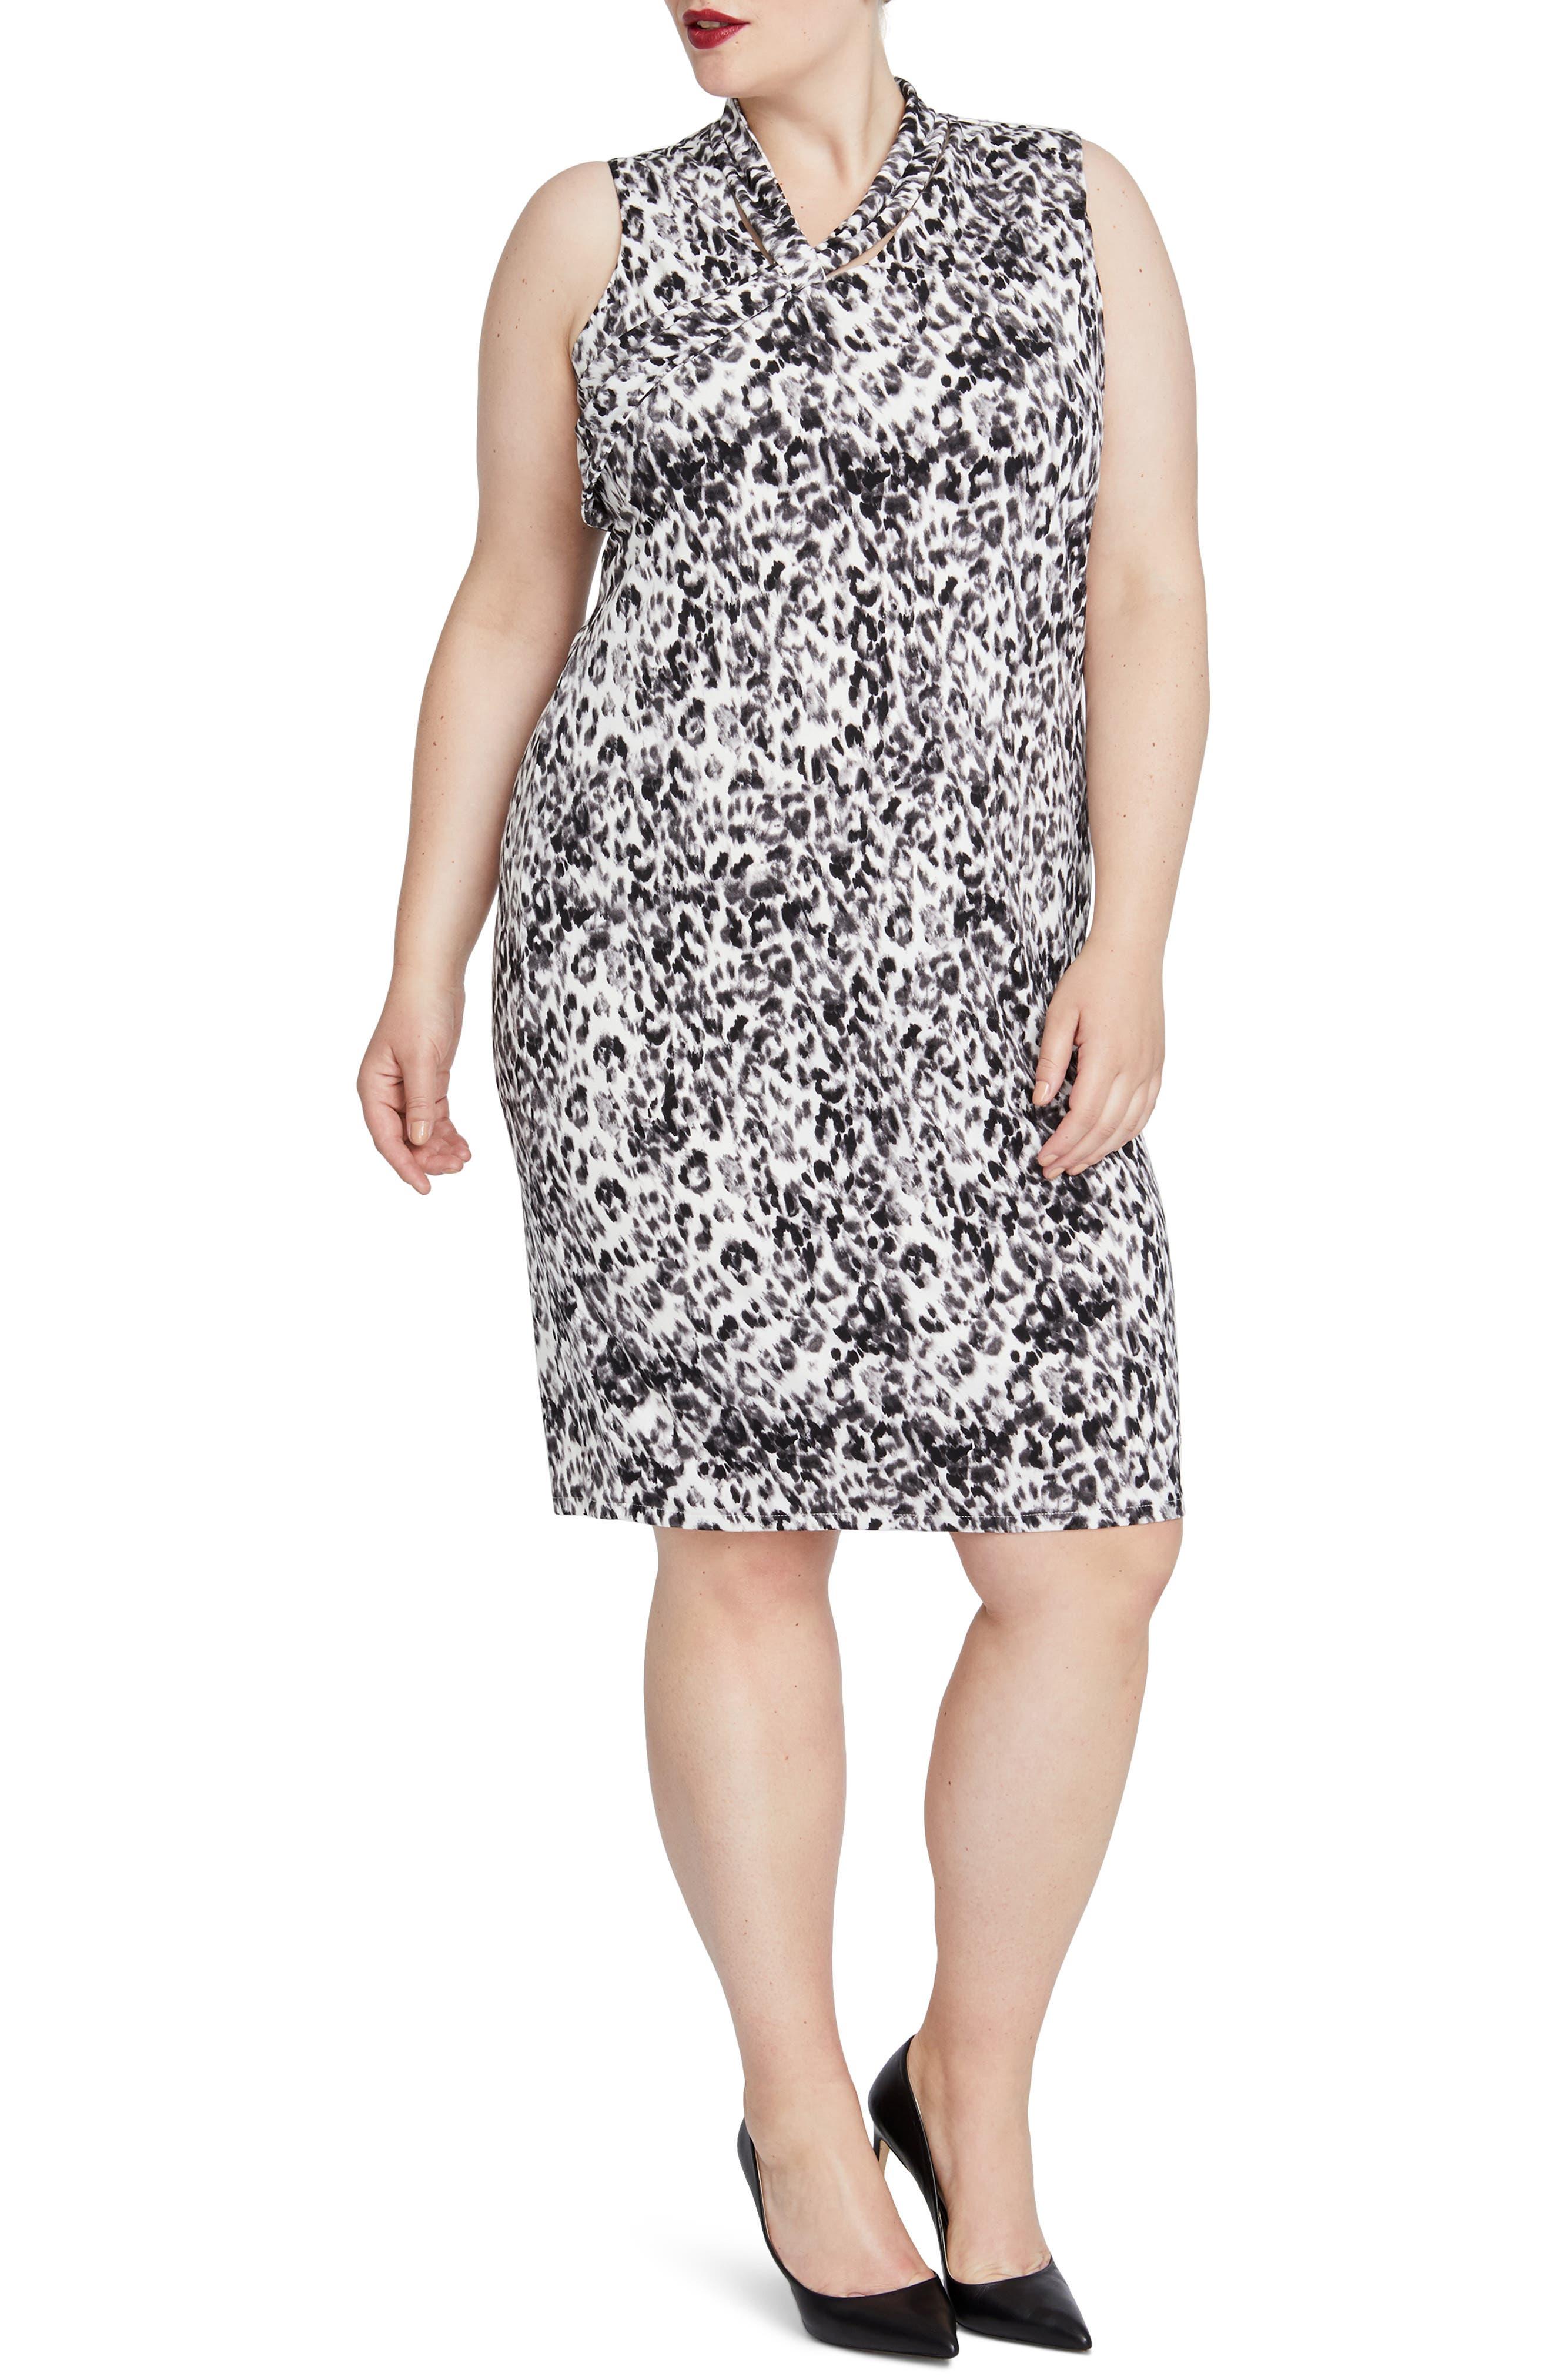 Axel Leopard Print Dress,                             Main thumbnail 1, color,                             001